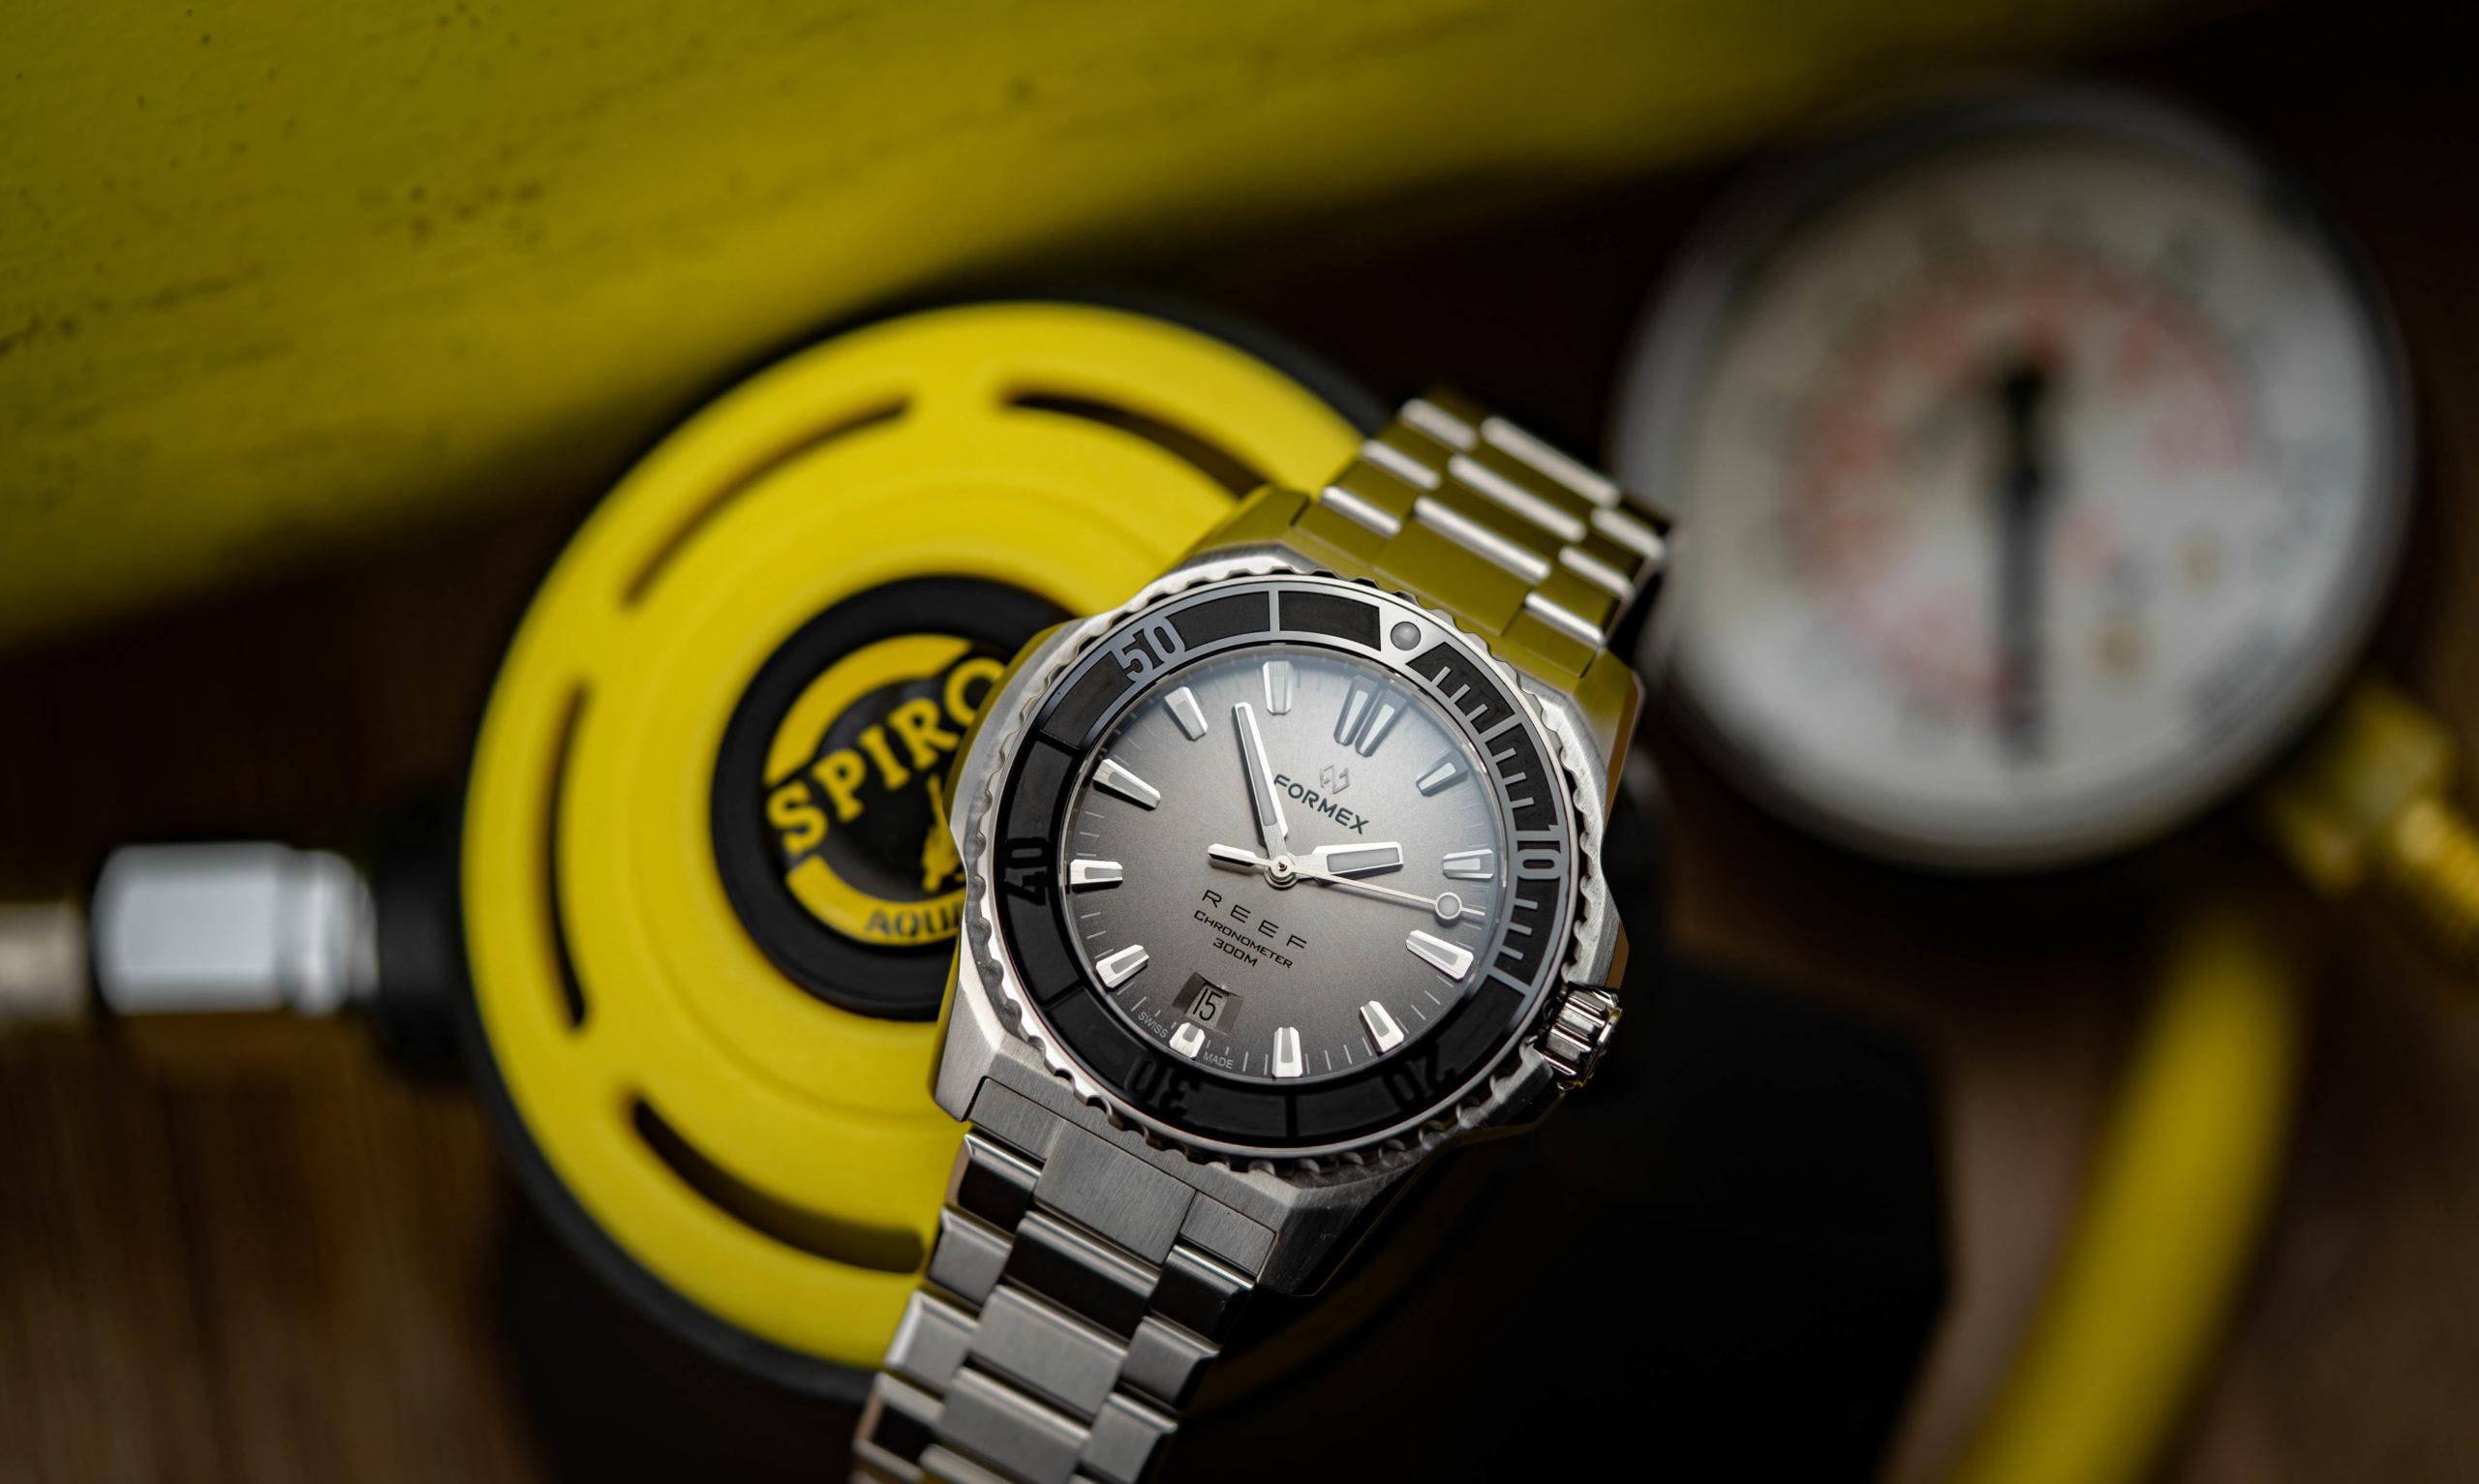 Formex-Reef-Automatik-Chronometer-300m-25